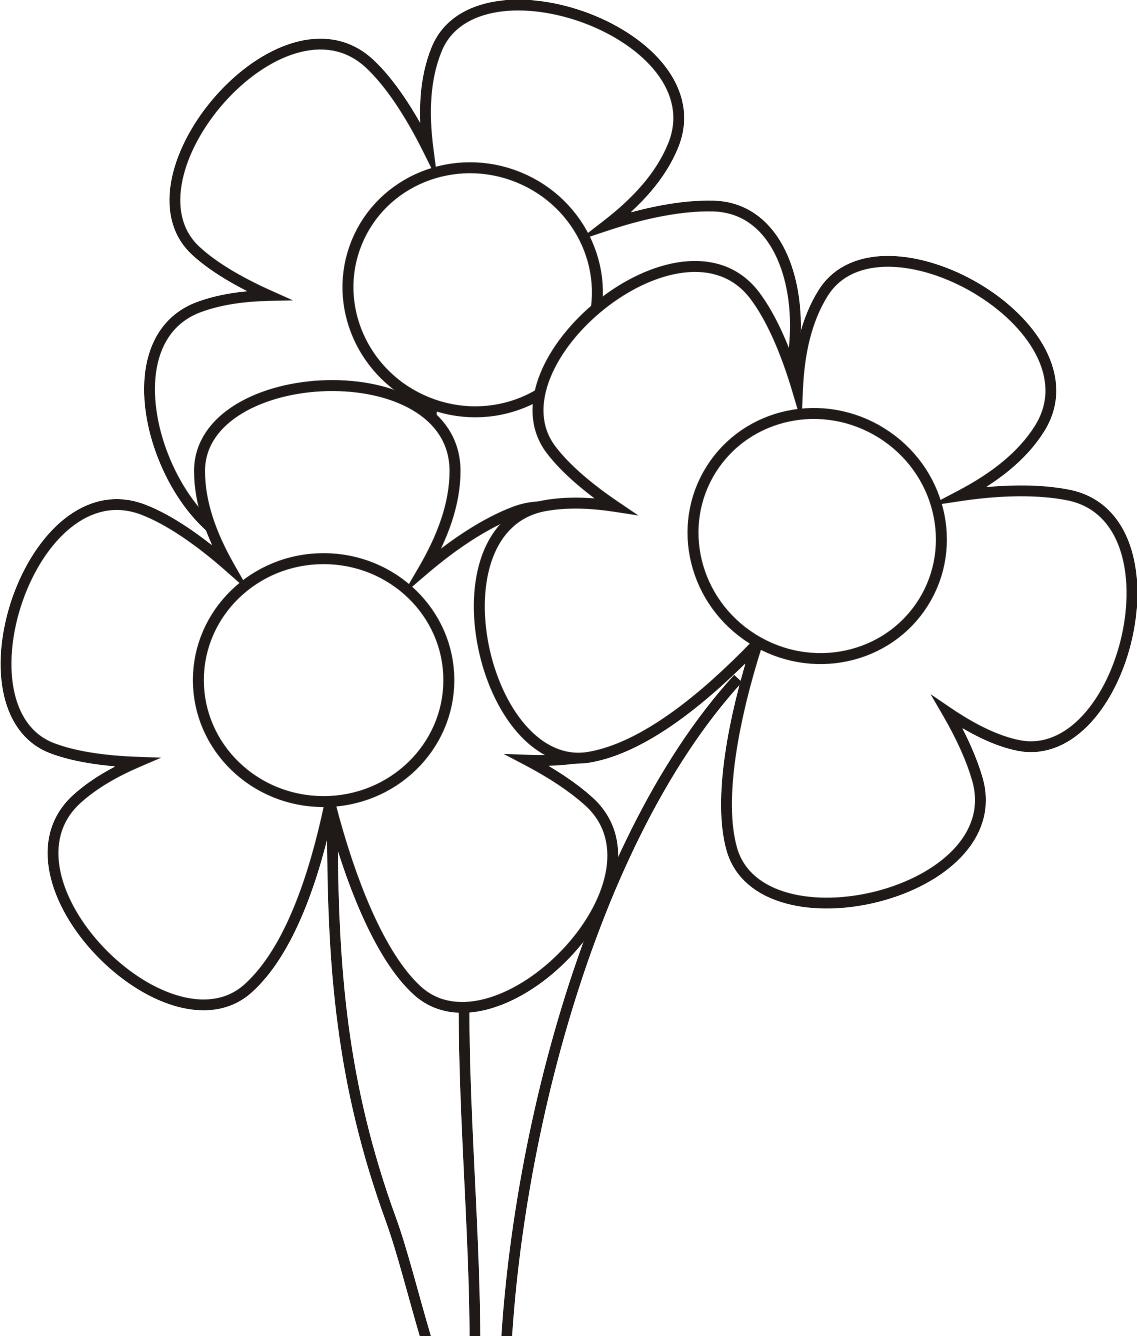 dibujos para colorear para ninas